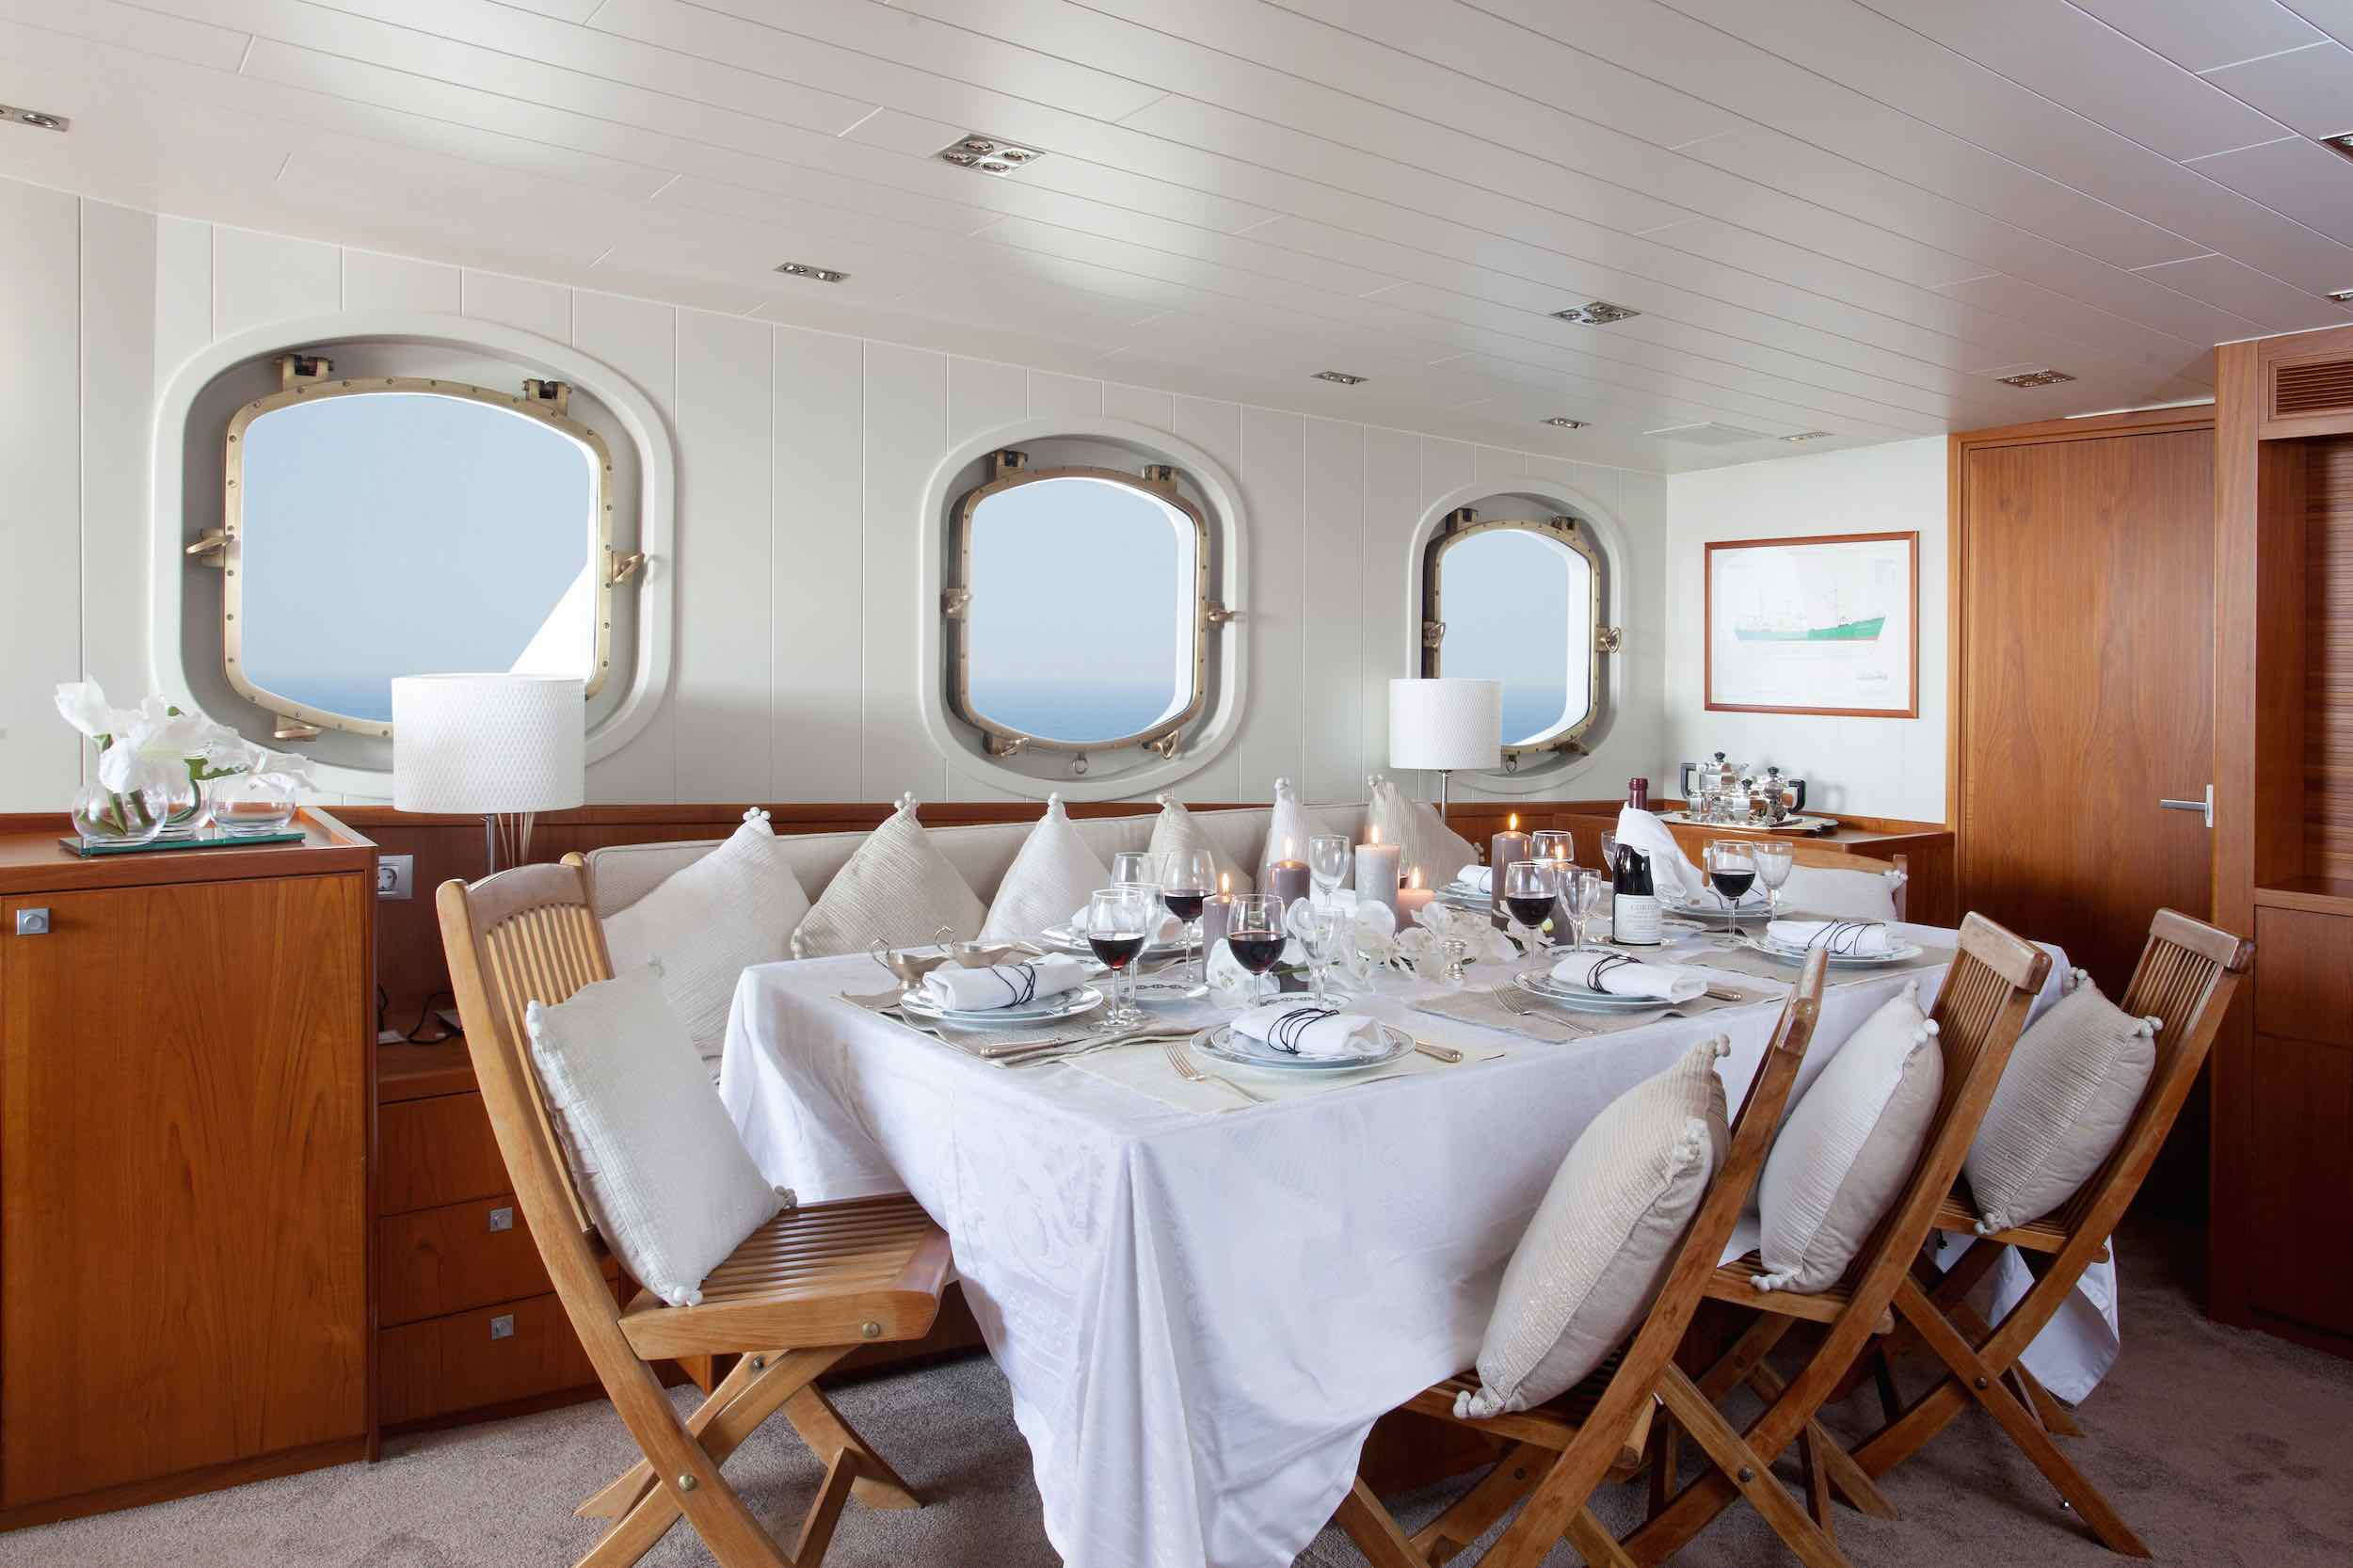 Motor yacht Drenec dining table.jpeg